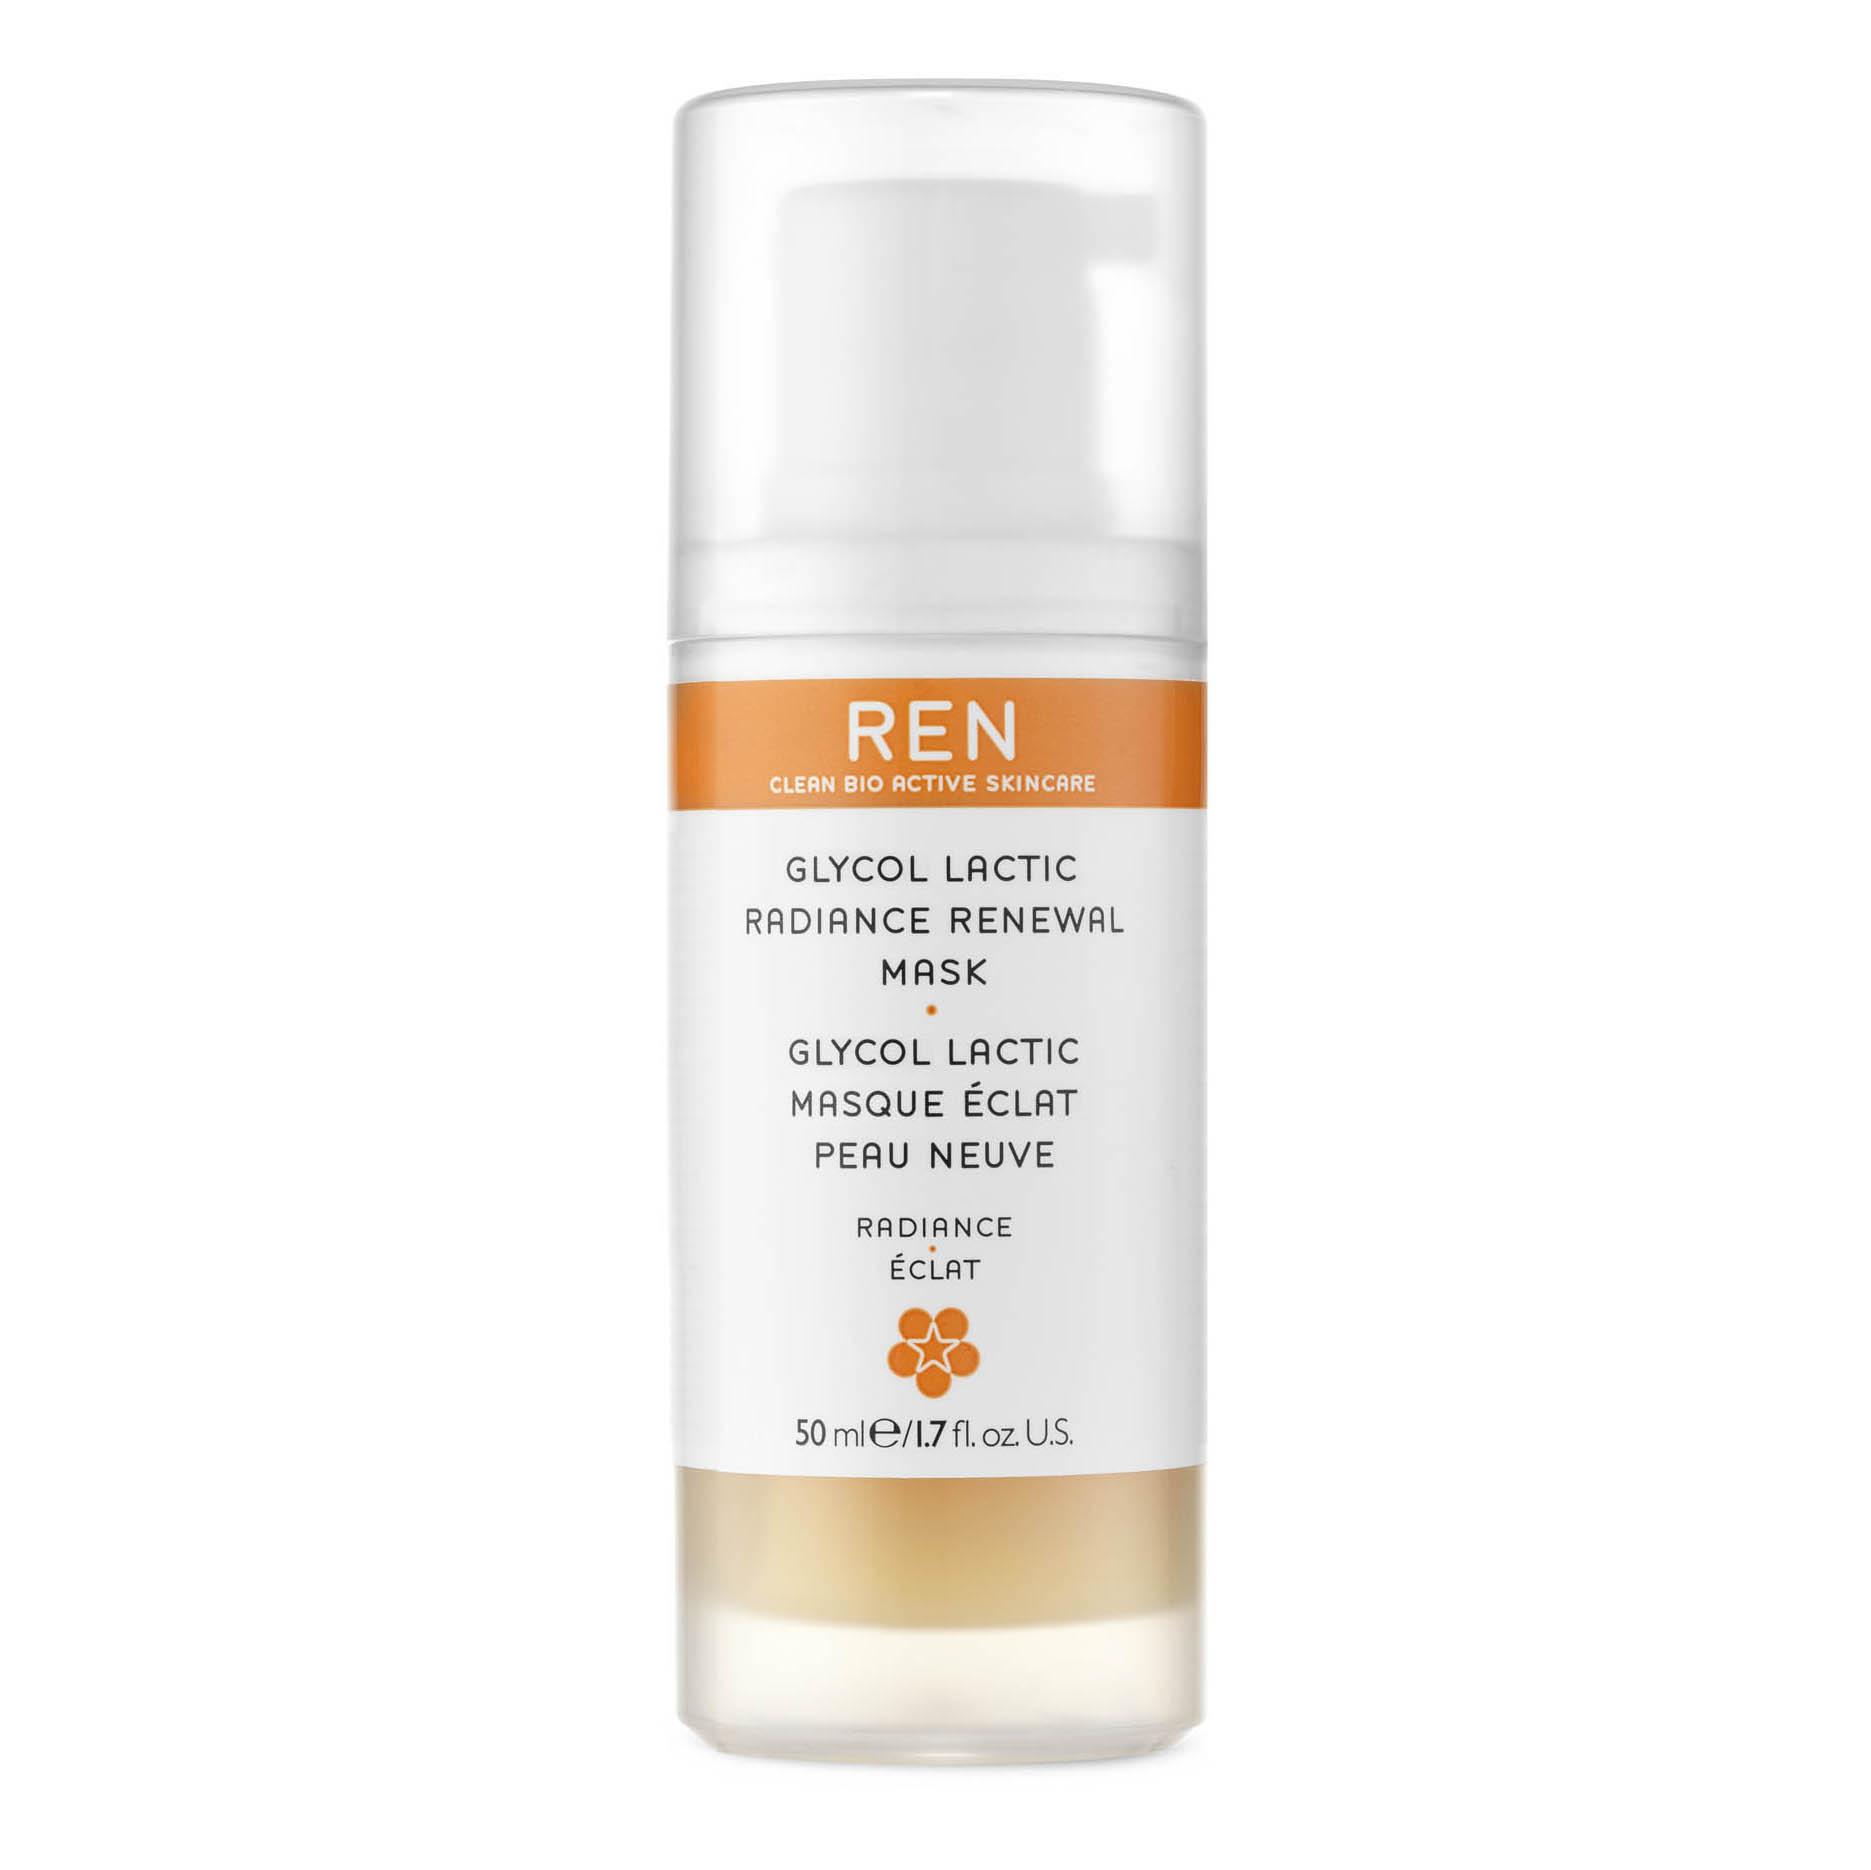 REN Glycol Lactic Skin Renewal Peel Mask (MECCA)